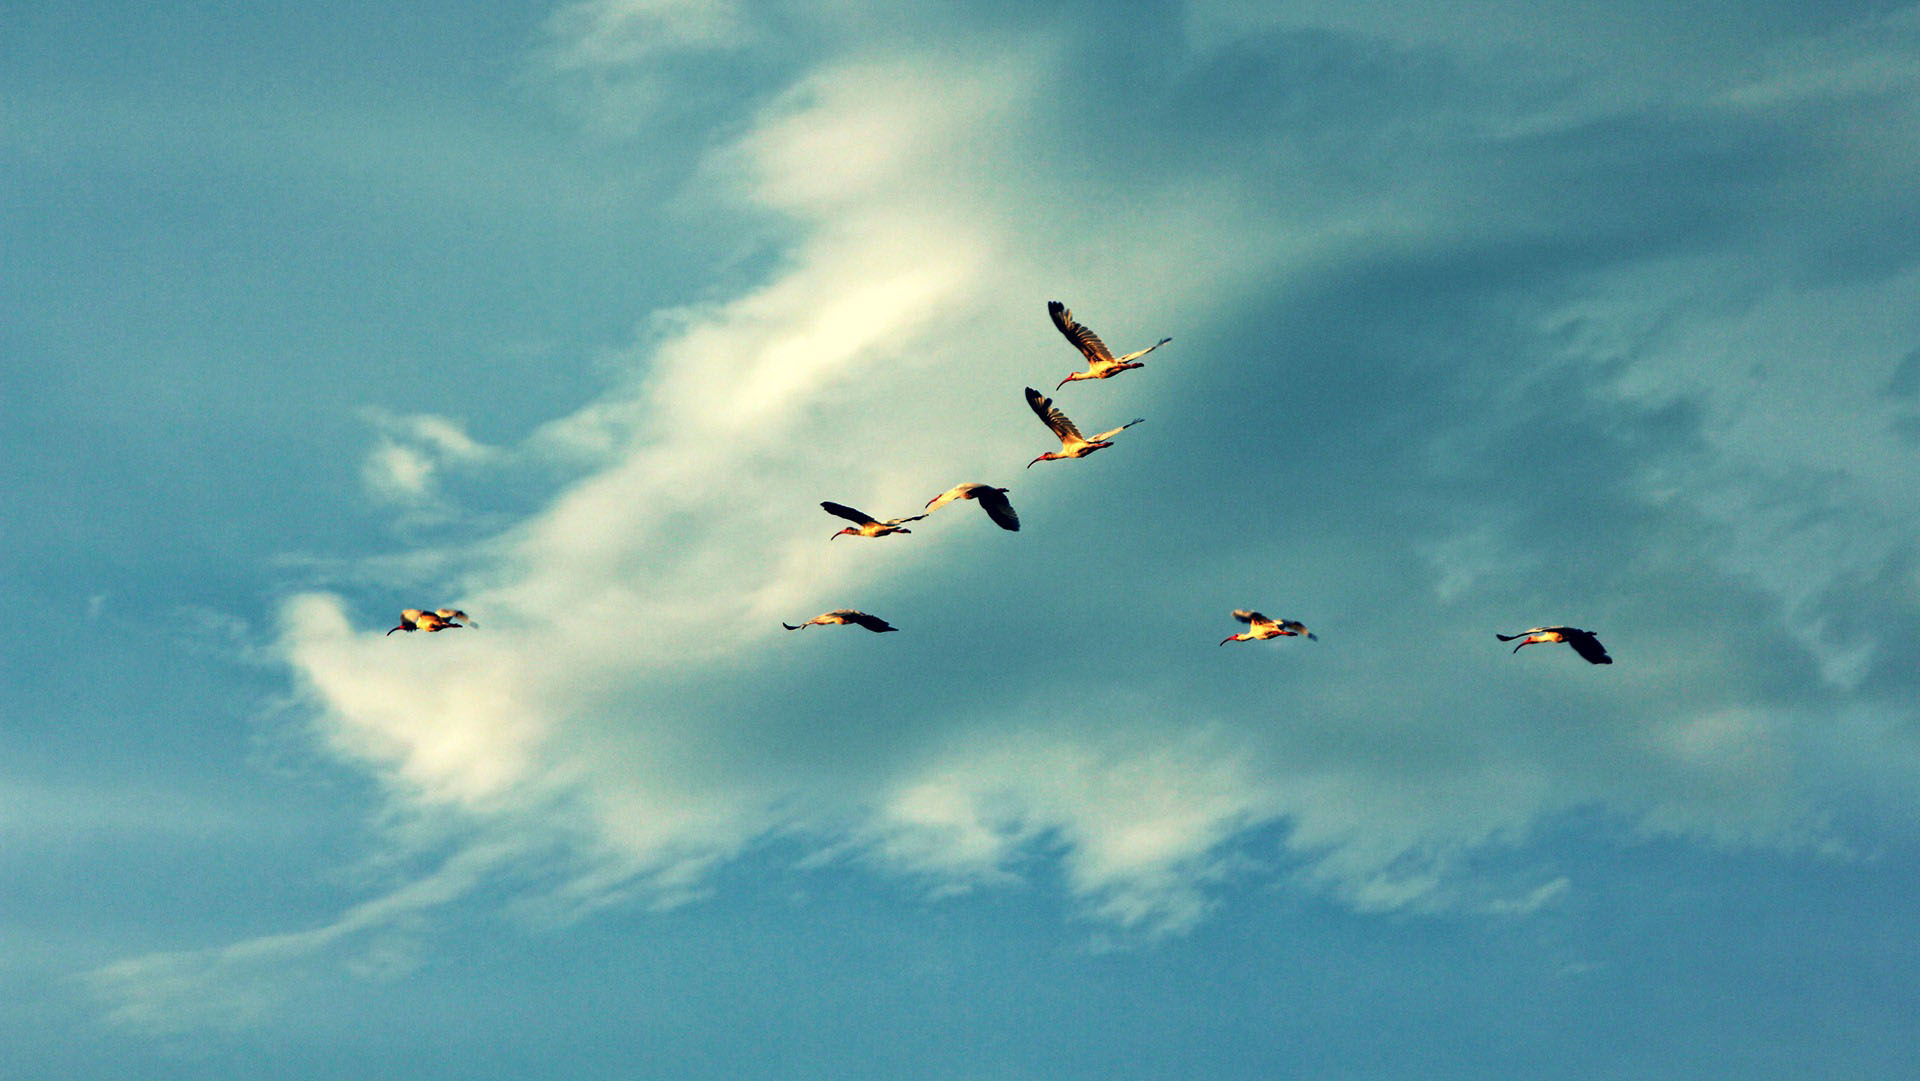 Freedom of flying geese wallpaper Animal desktop background Animal 1920x1081